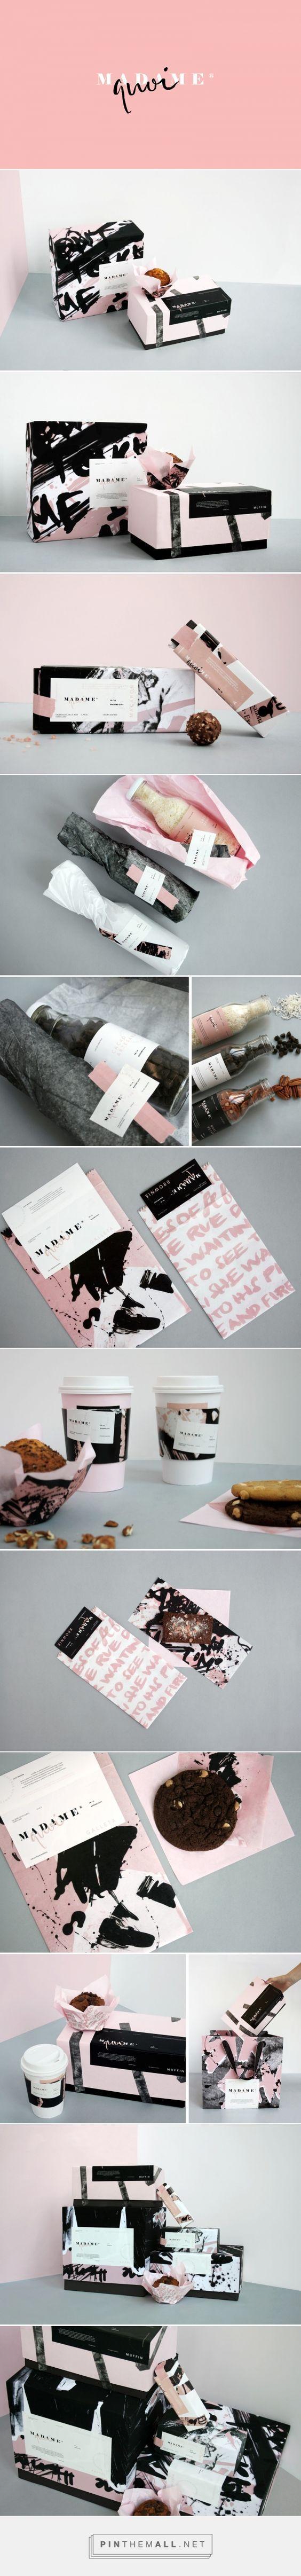 Madame Quoi Branding | Fivestar Branding – Design and Branding Agency & Inspiration Gallery